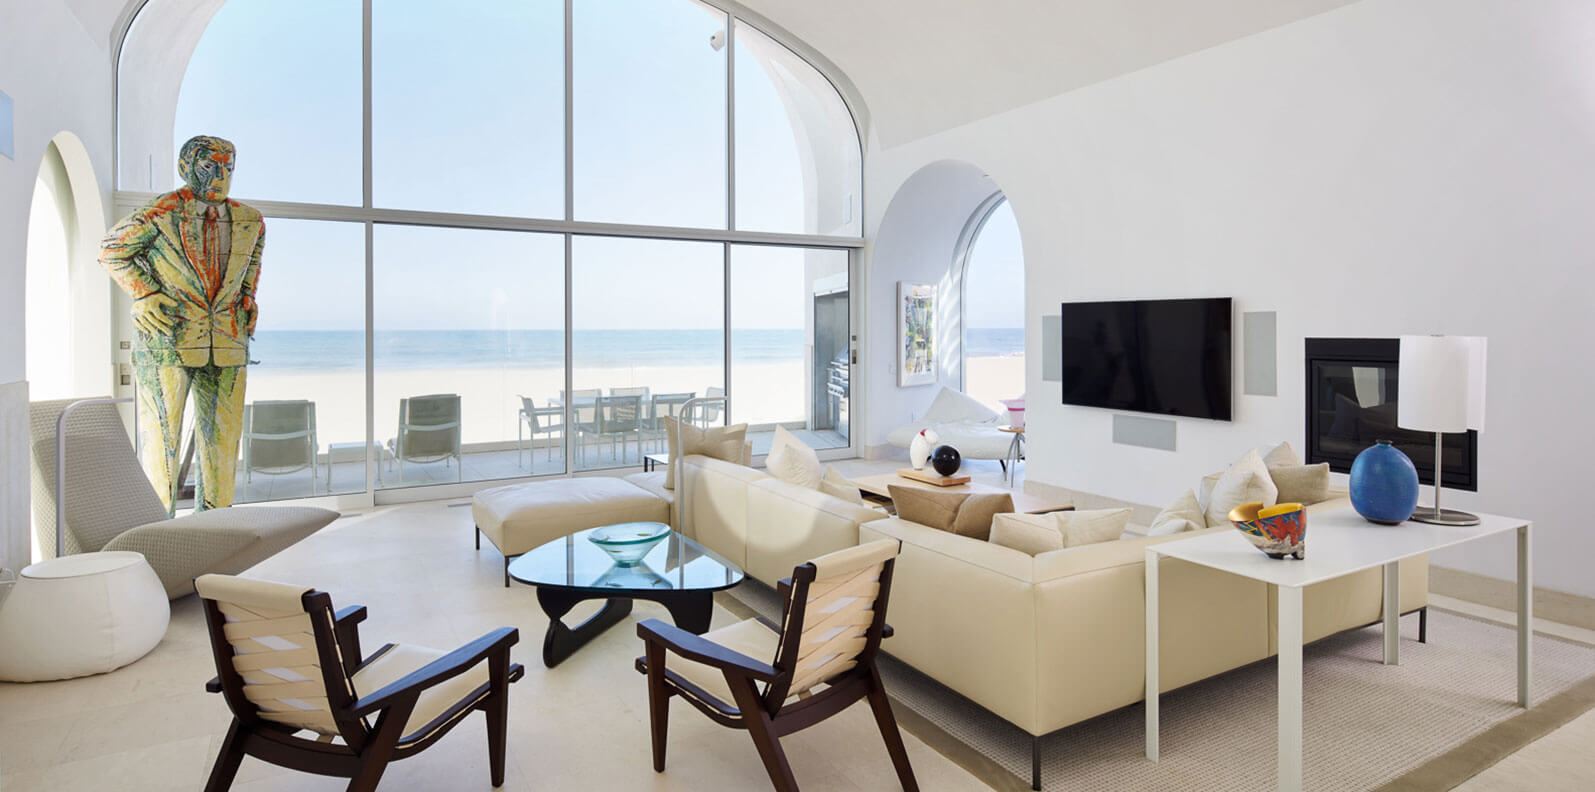 Home - Associates III Interior Design